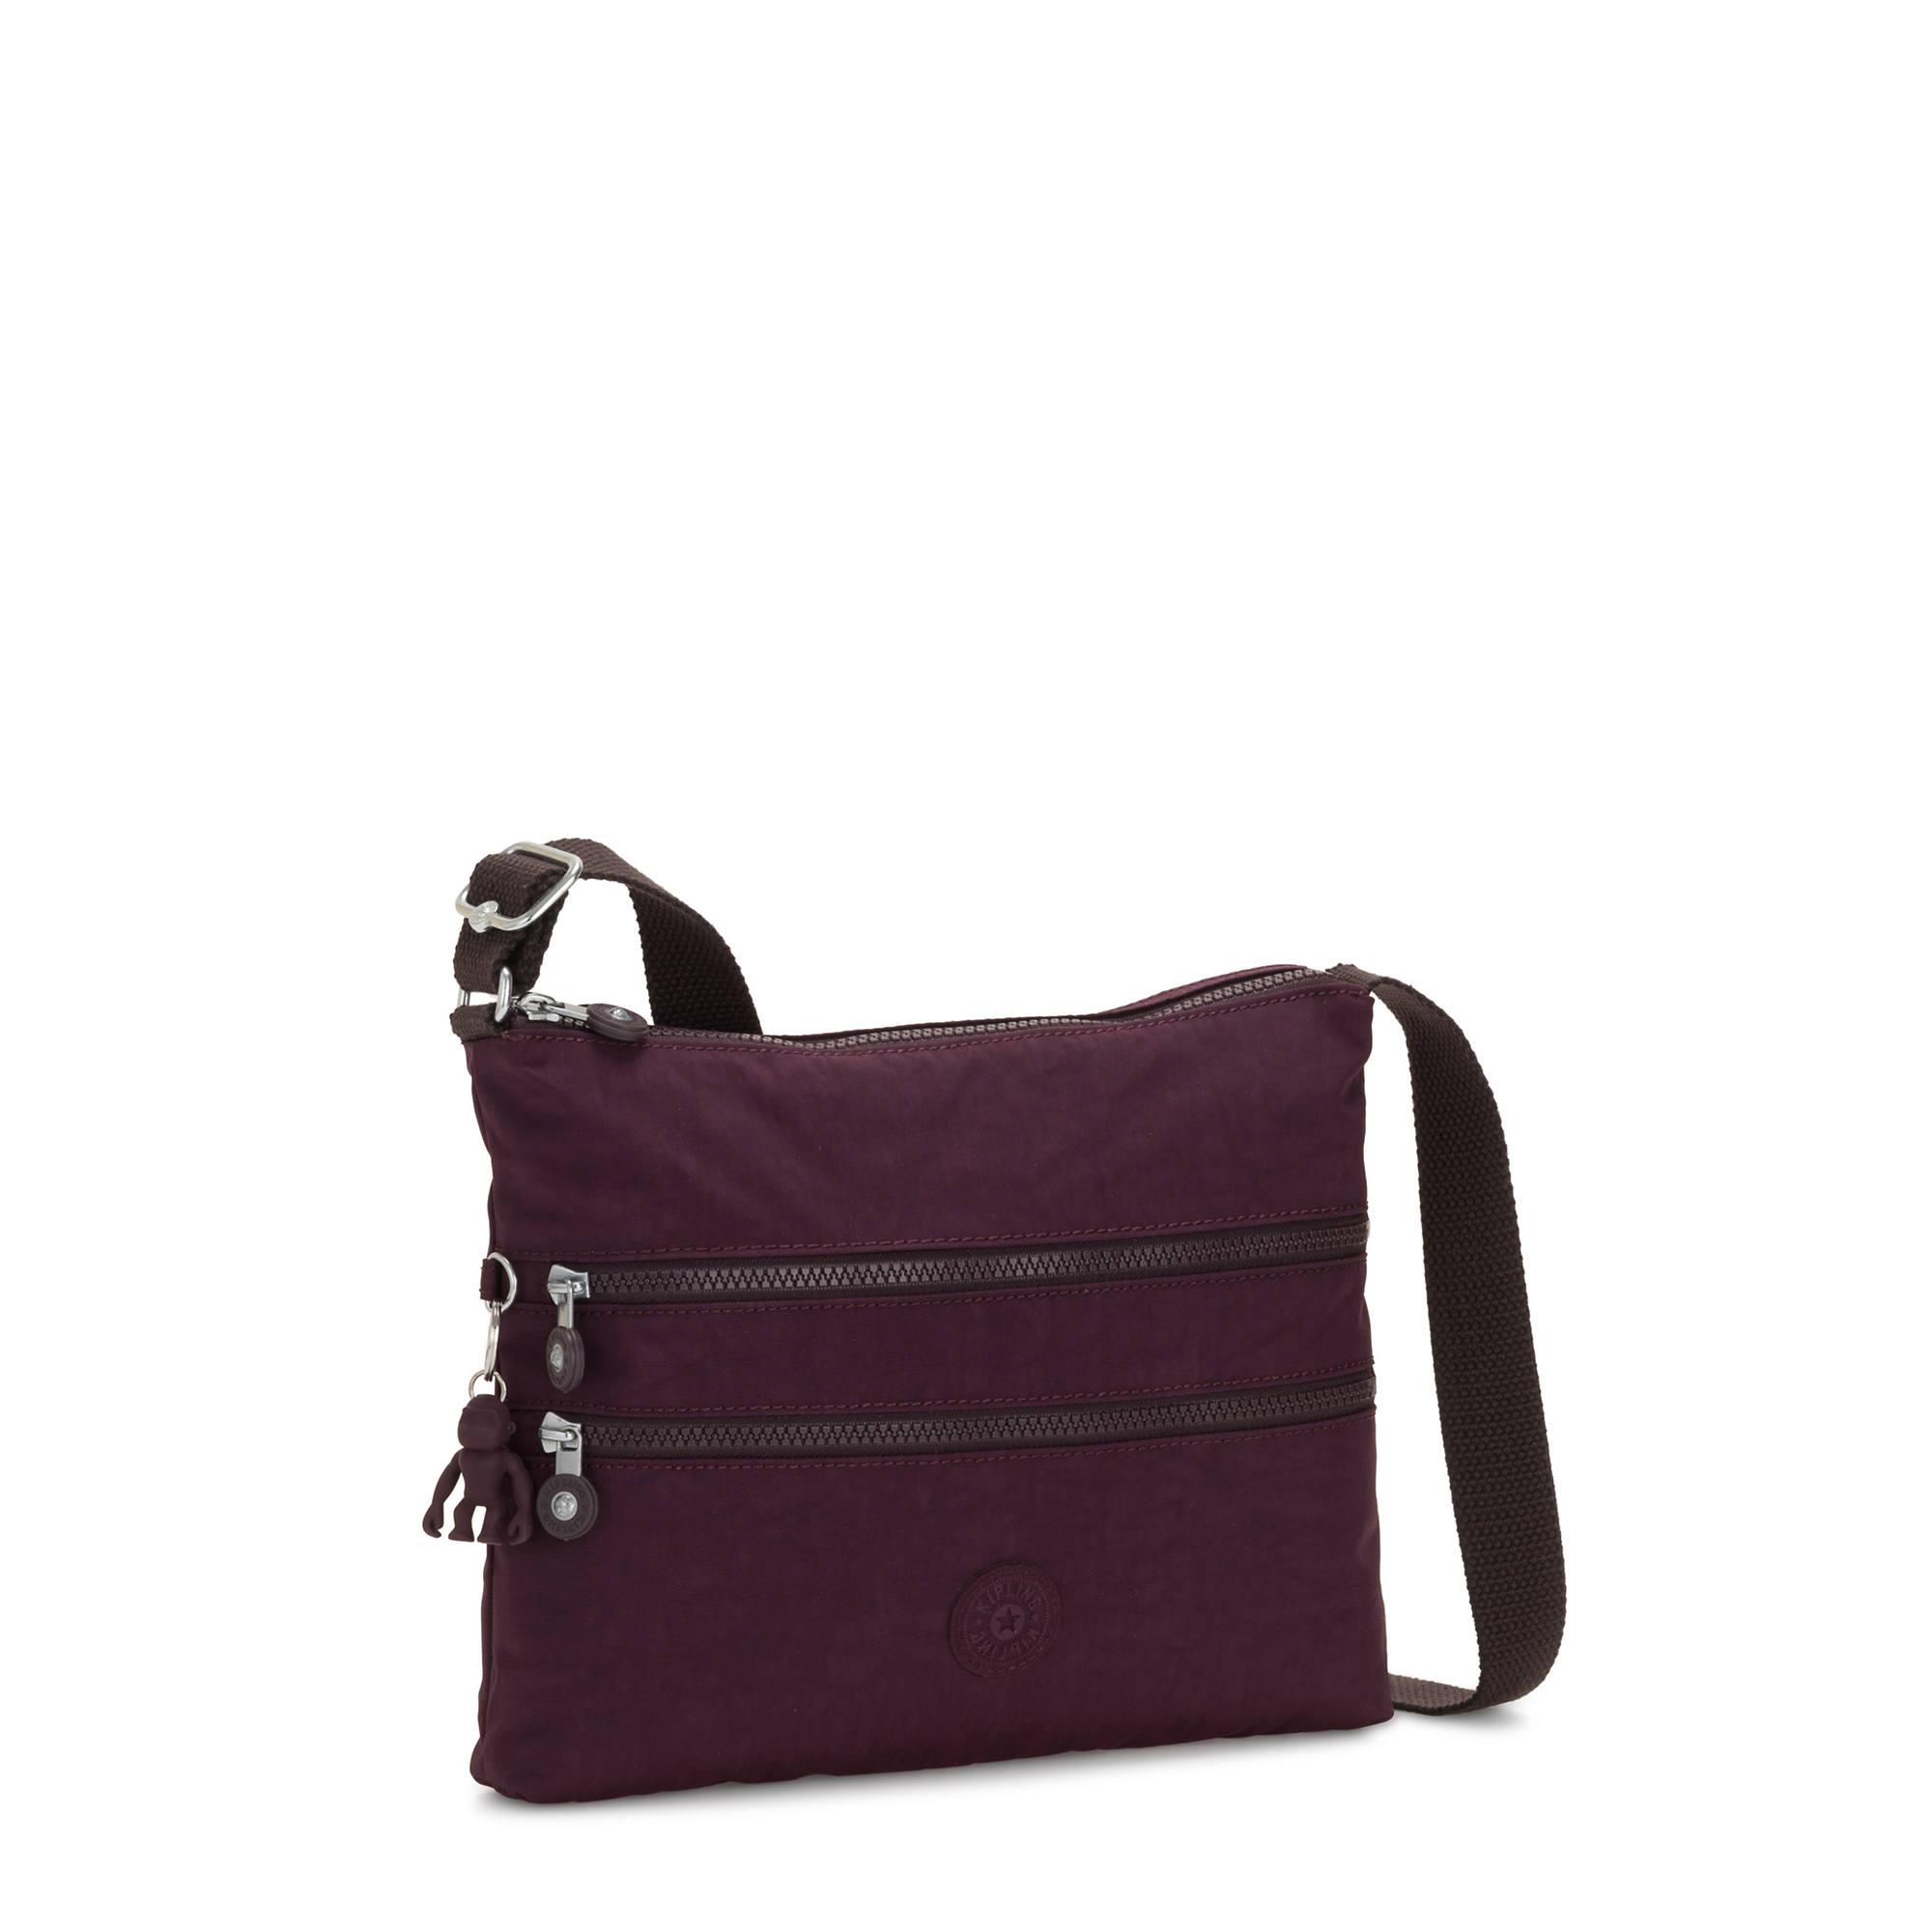 Kipling-Alvar-Metallic-Crossbody-Bag miniature 20